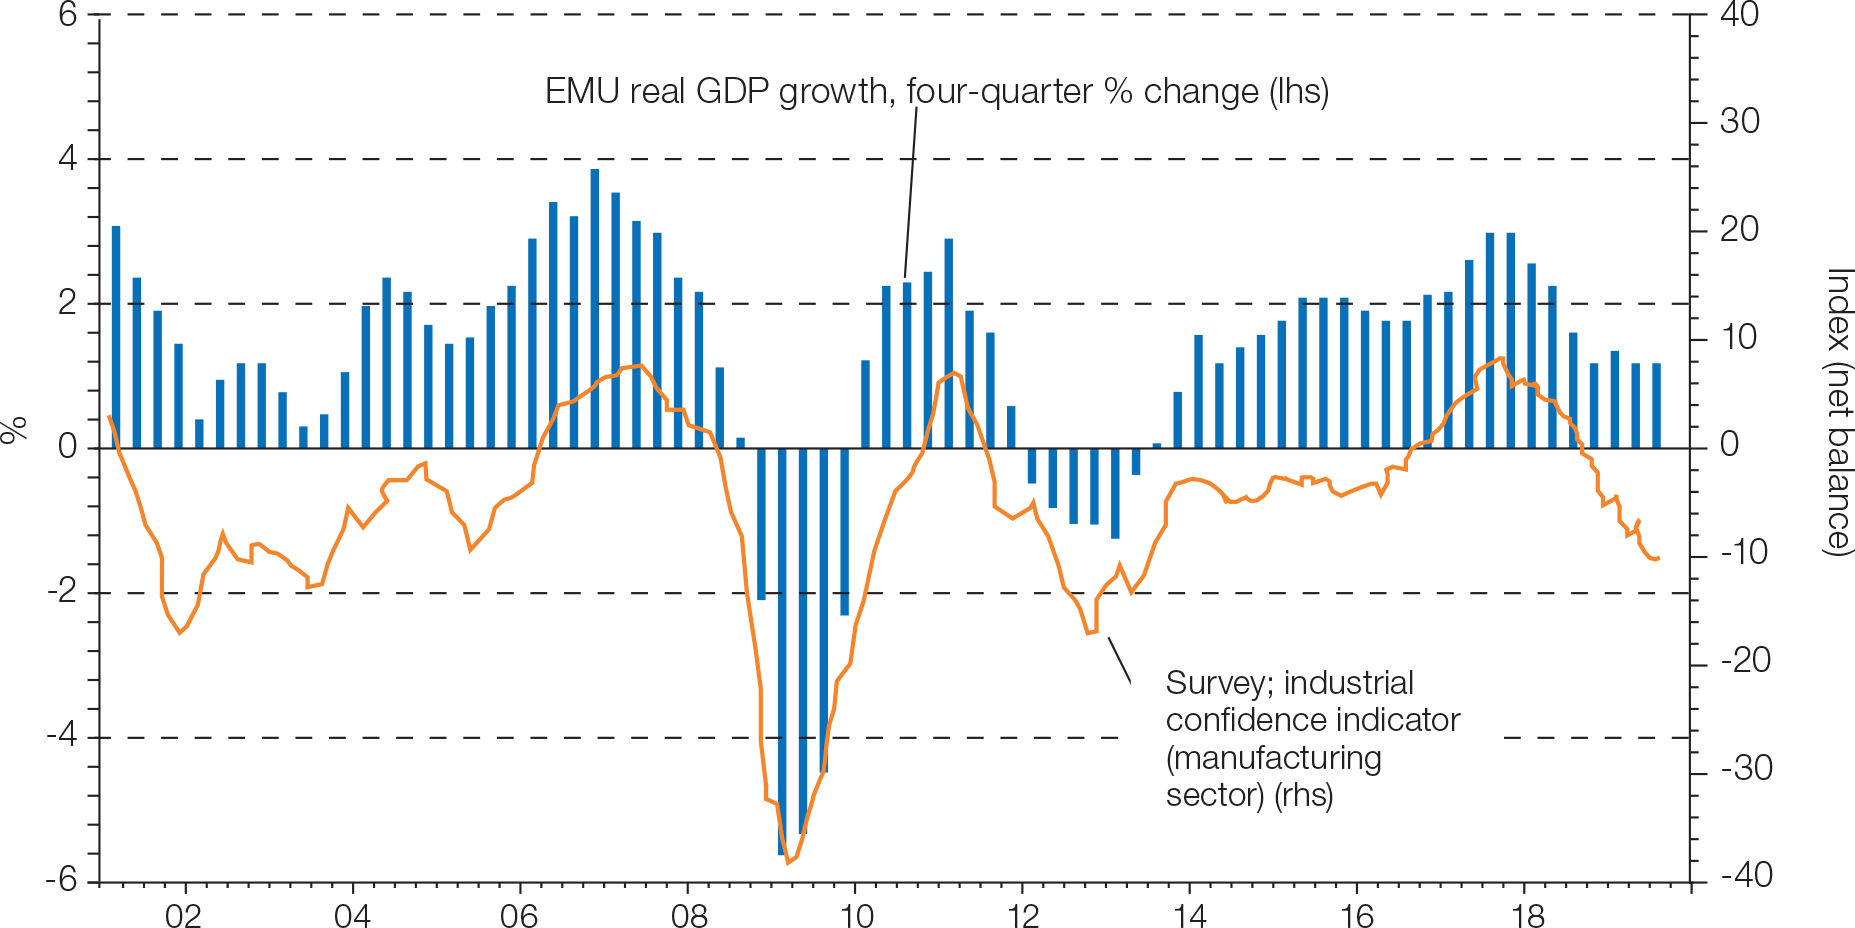 Chart 1: EMU economic data remains rather downbeat